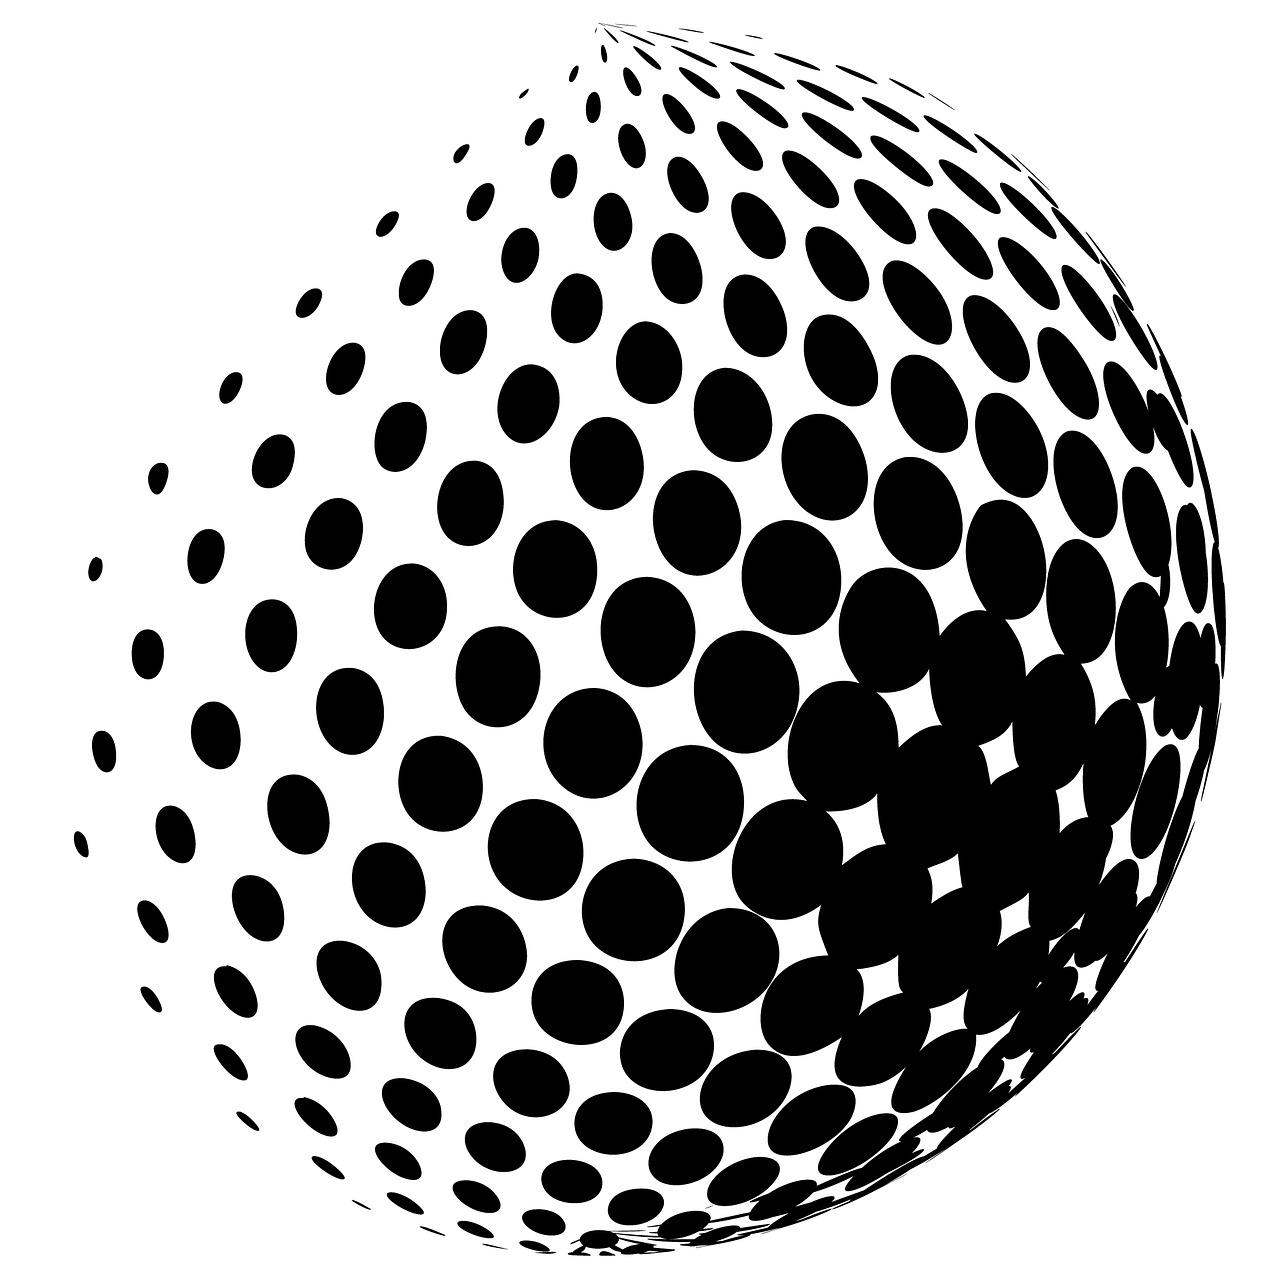 Картинка с точками